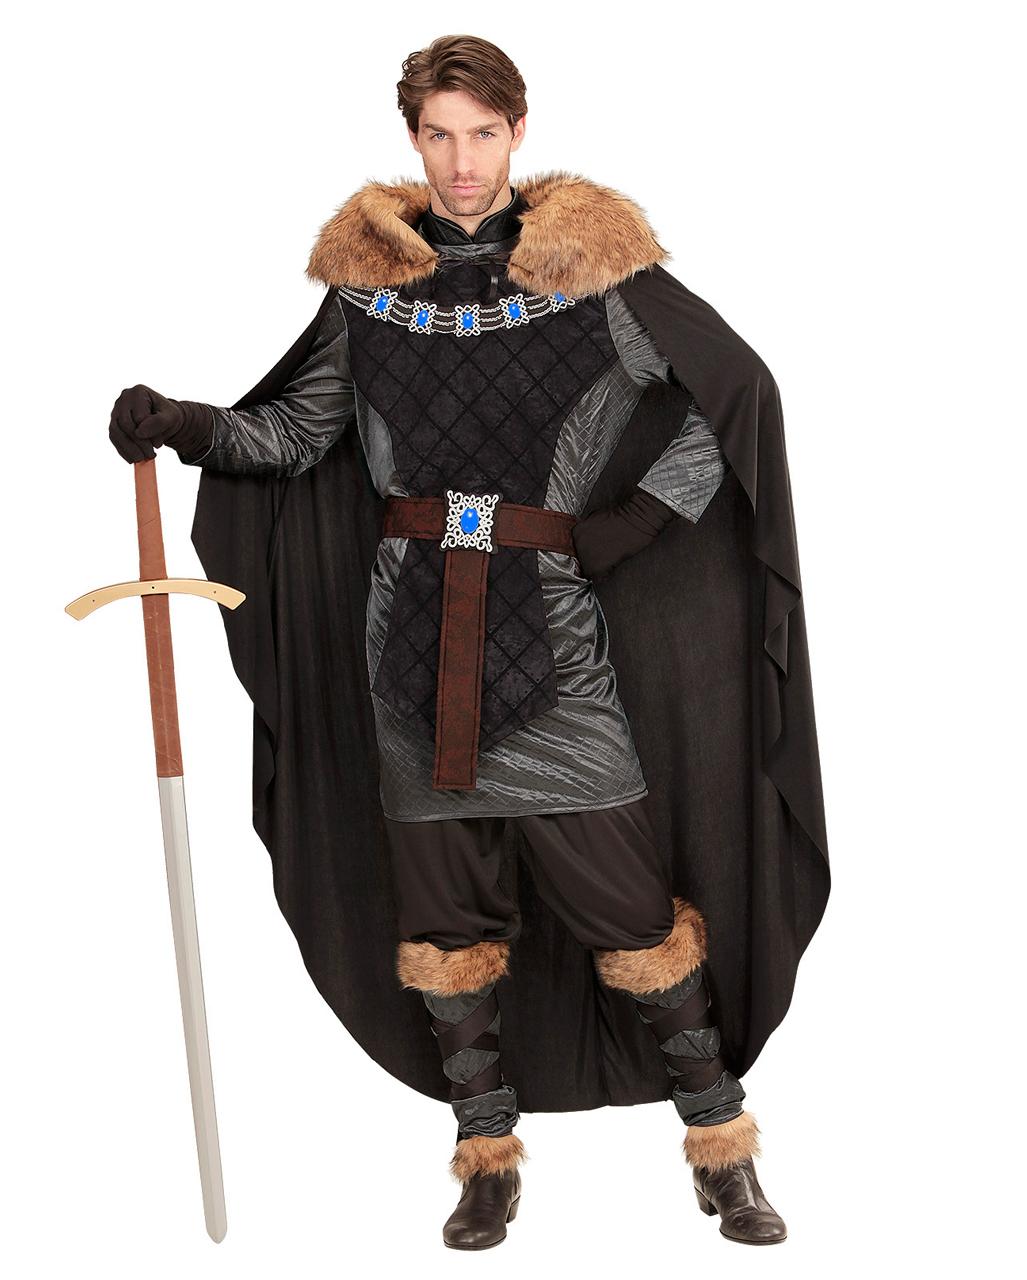 Medieval Prince Costume ...  sc 1 st  Horror-Shop & Medieval Prince Costume for Halloween | horror-shop.com